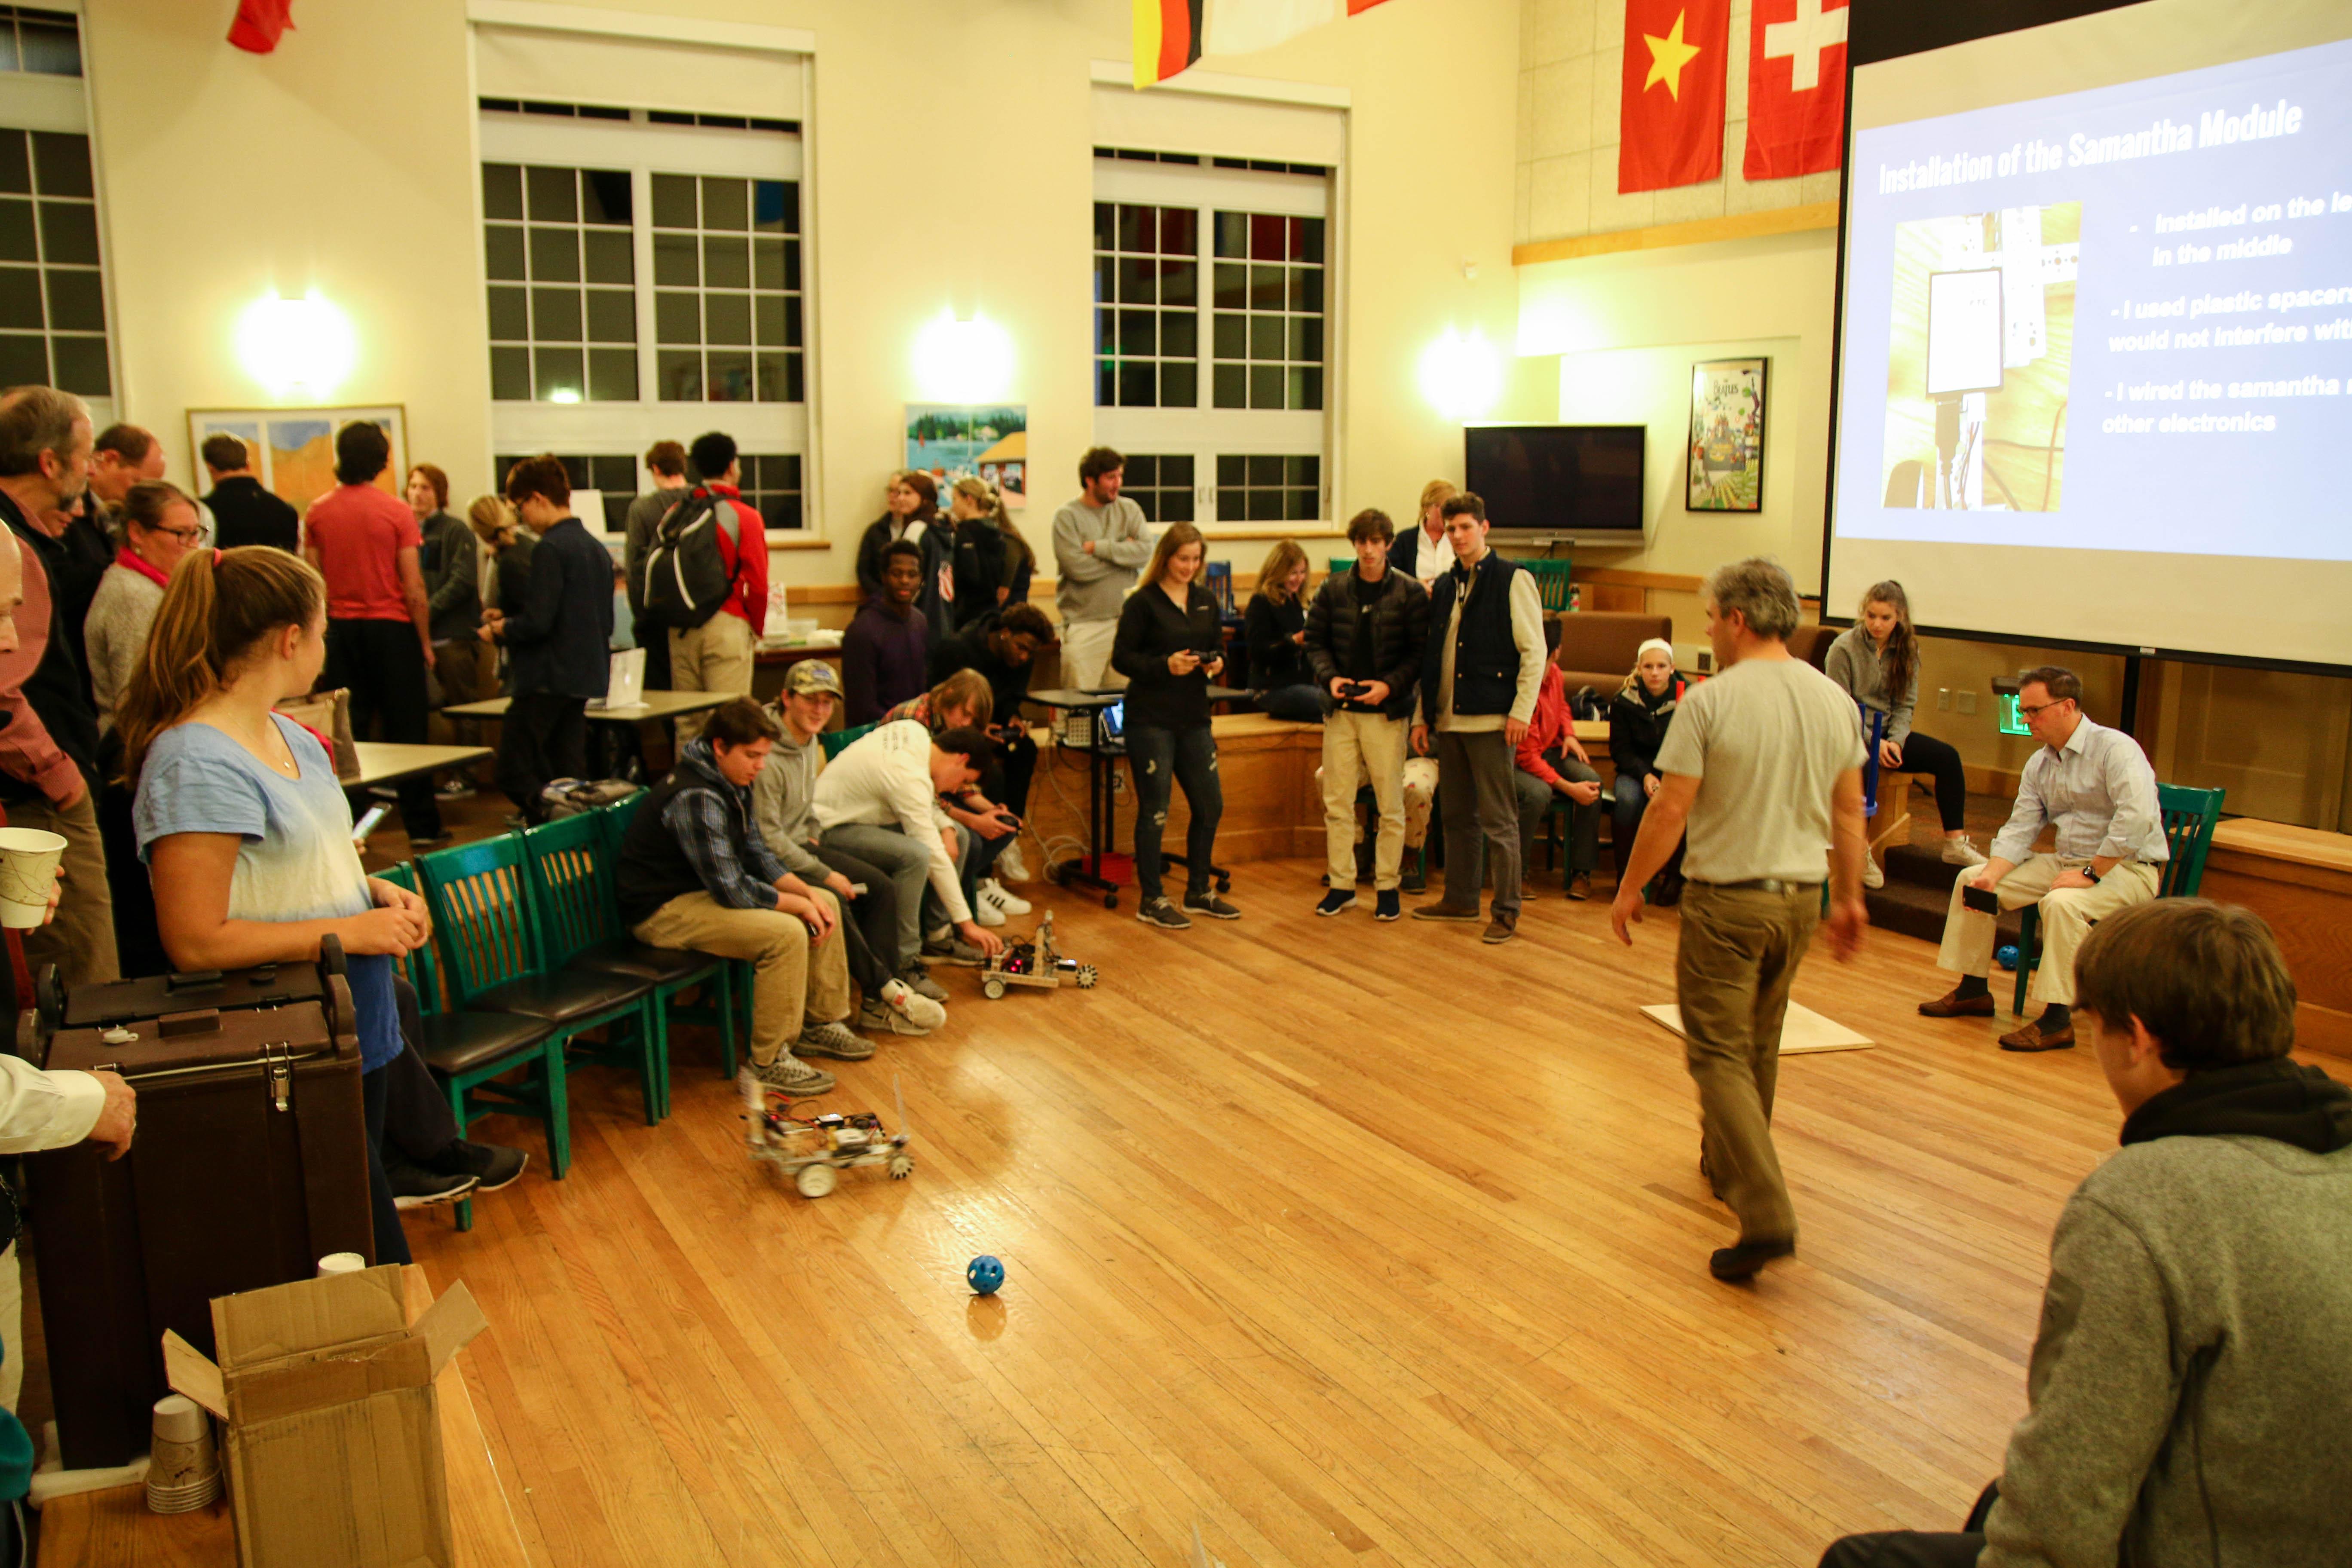 Proctor Academy Academic Lens Boarding School New England